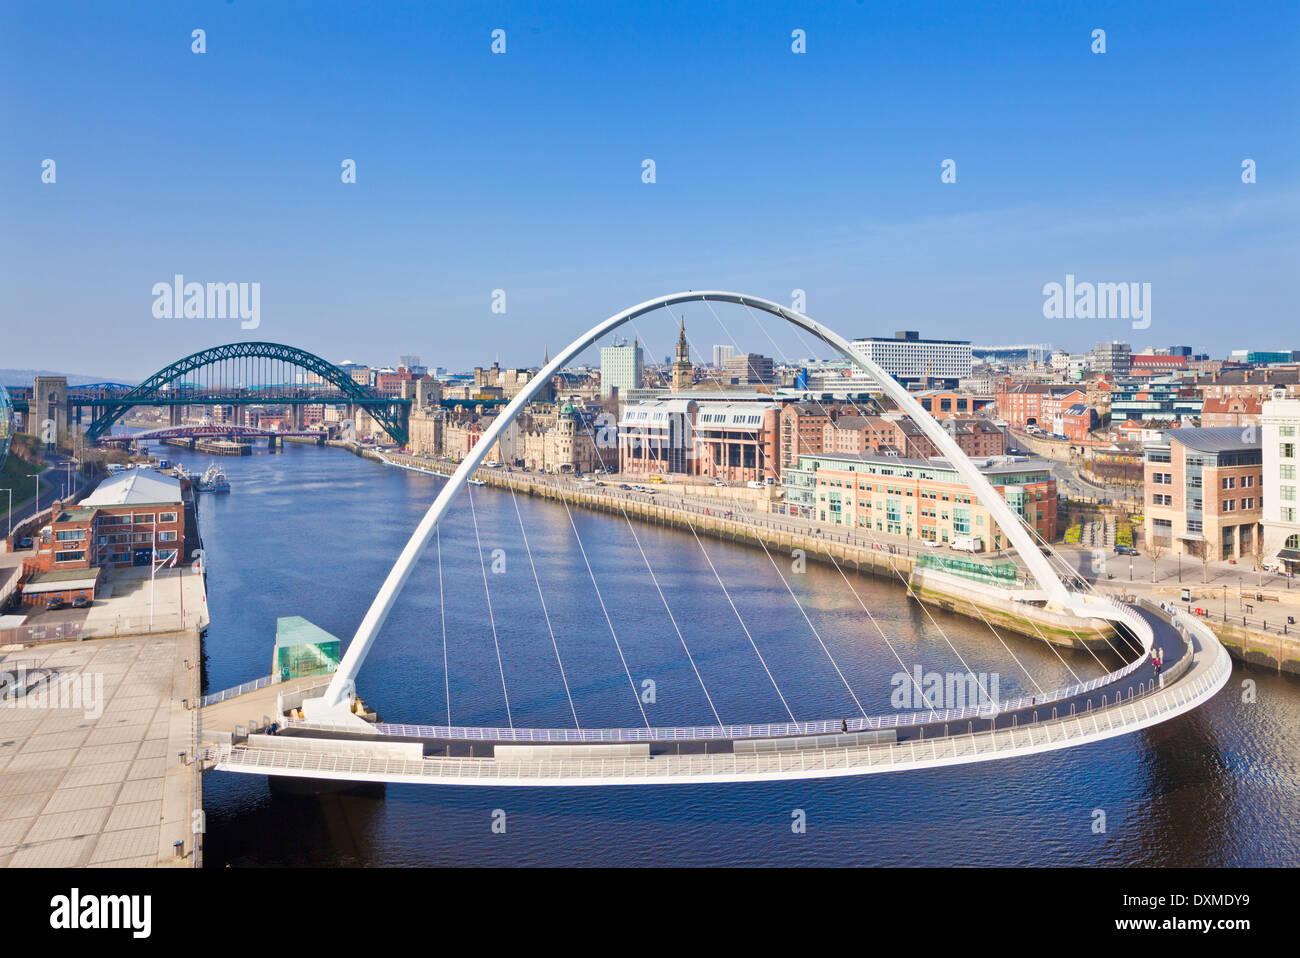 gateshead Millennium bridge and Tyne bridge over River Tyne Newcastle upon Tyne skyline Tyne and Wear England UK Stock Photo